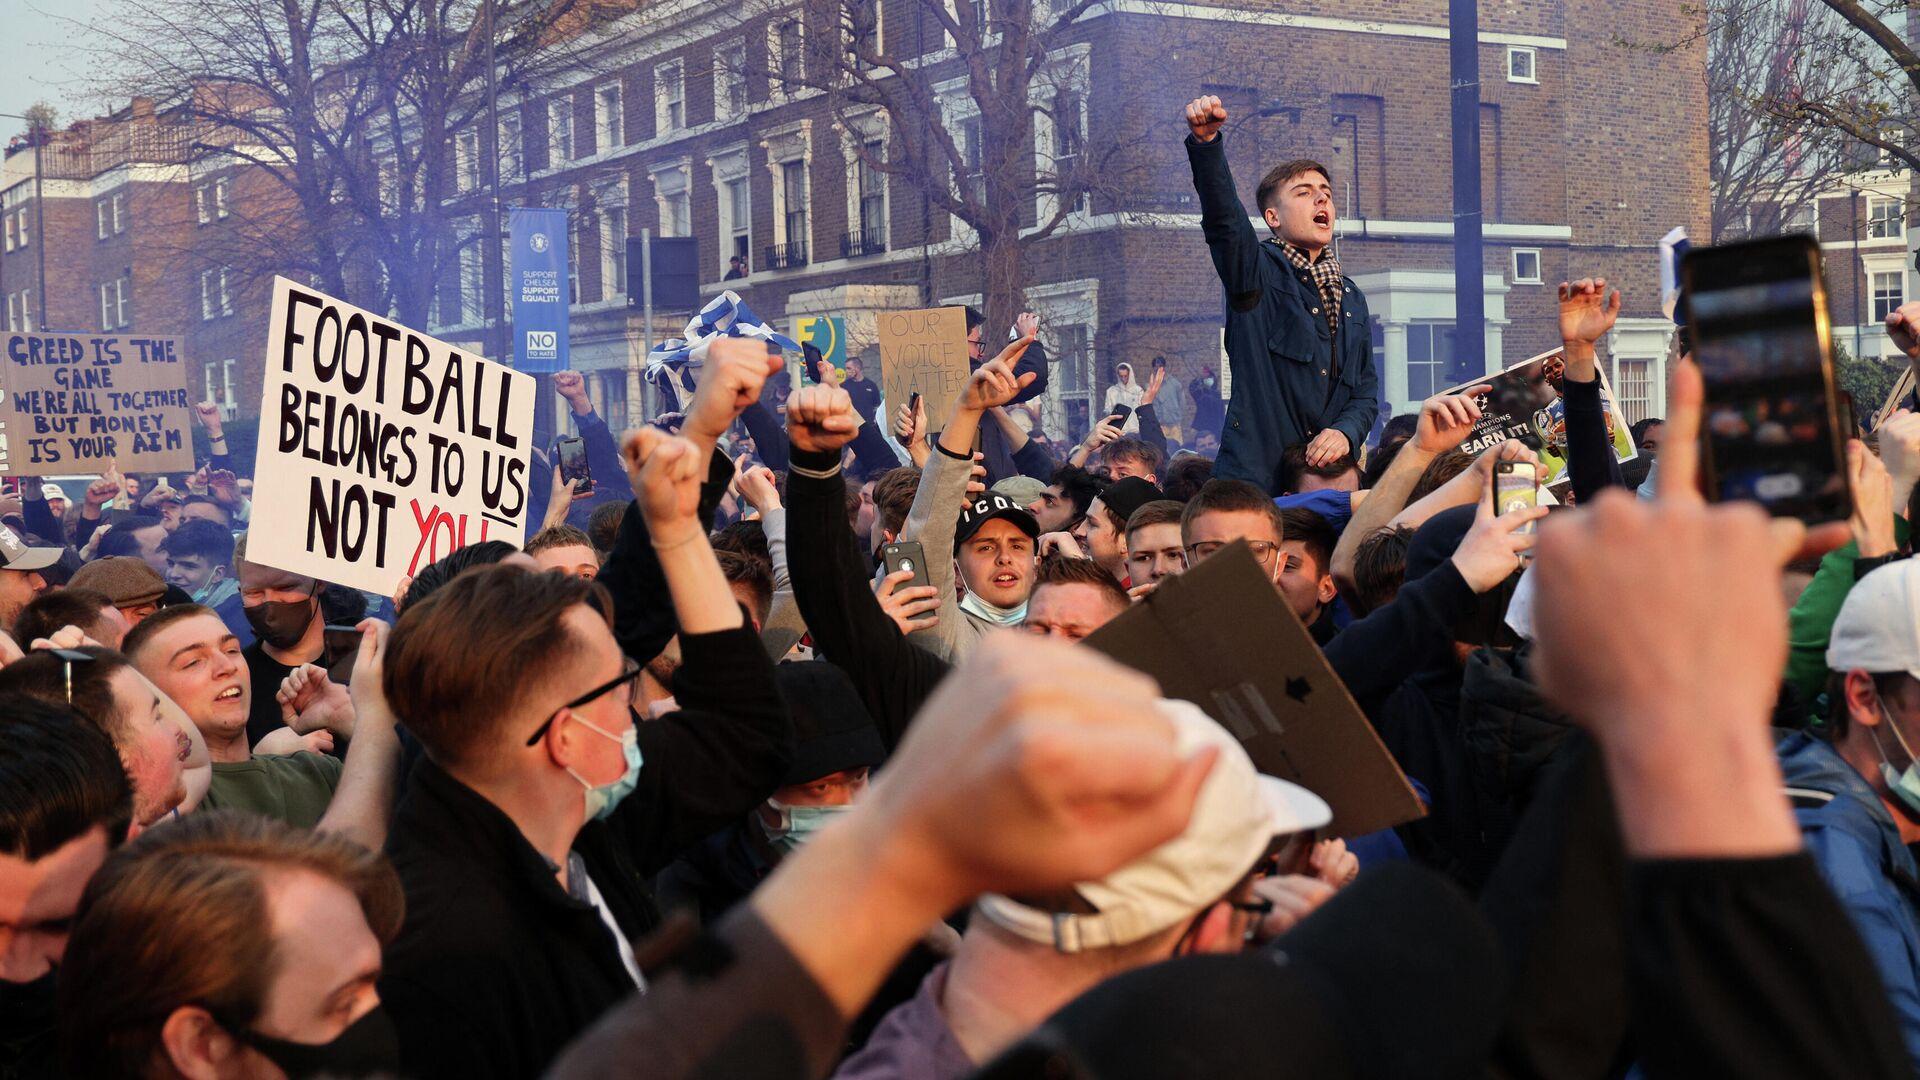 Болельщики Челси на акции протеста против Суперлиги - РИА Новости, 1920, 20.04.2021